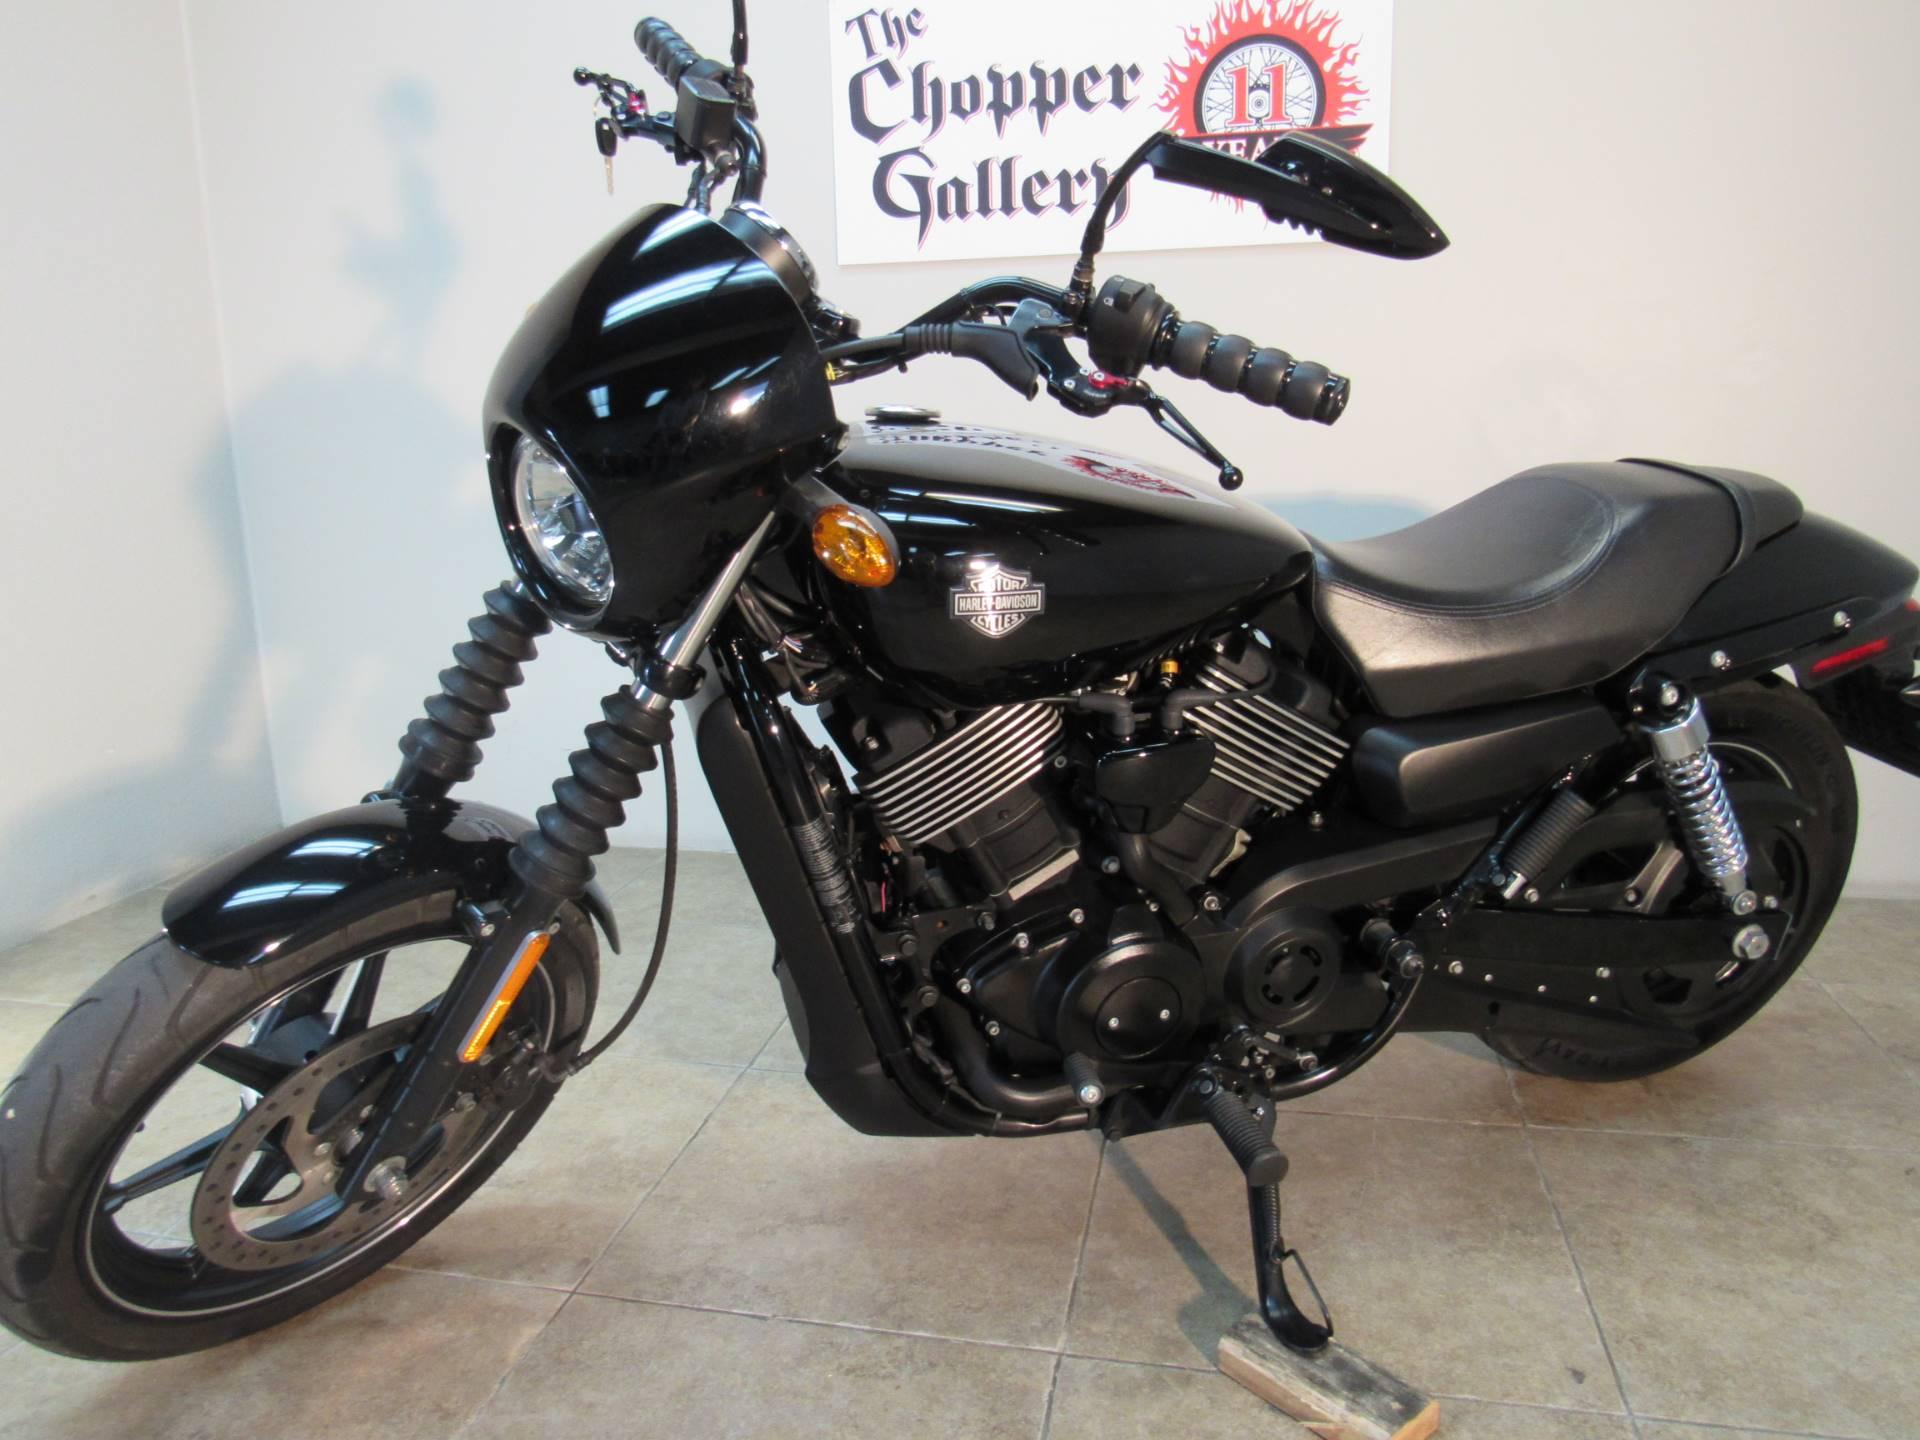 2016 Harley Davidson Street 750 In Temecula California Photo 1